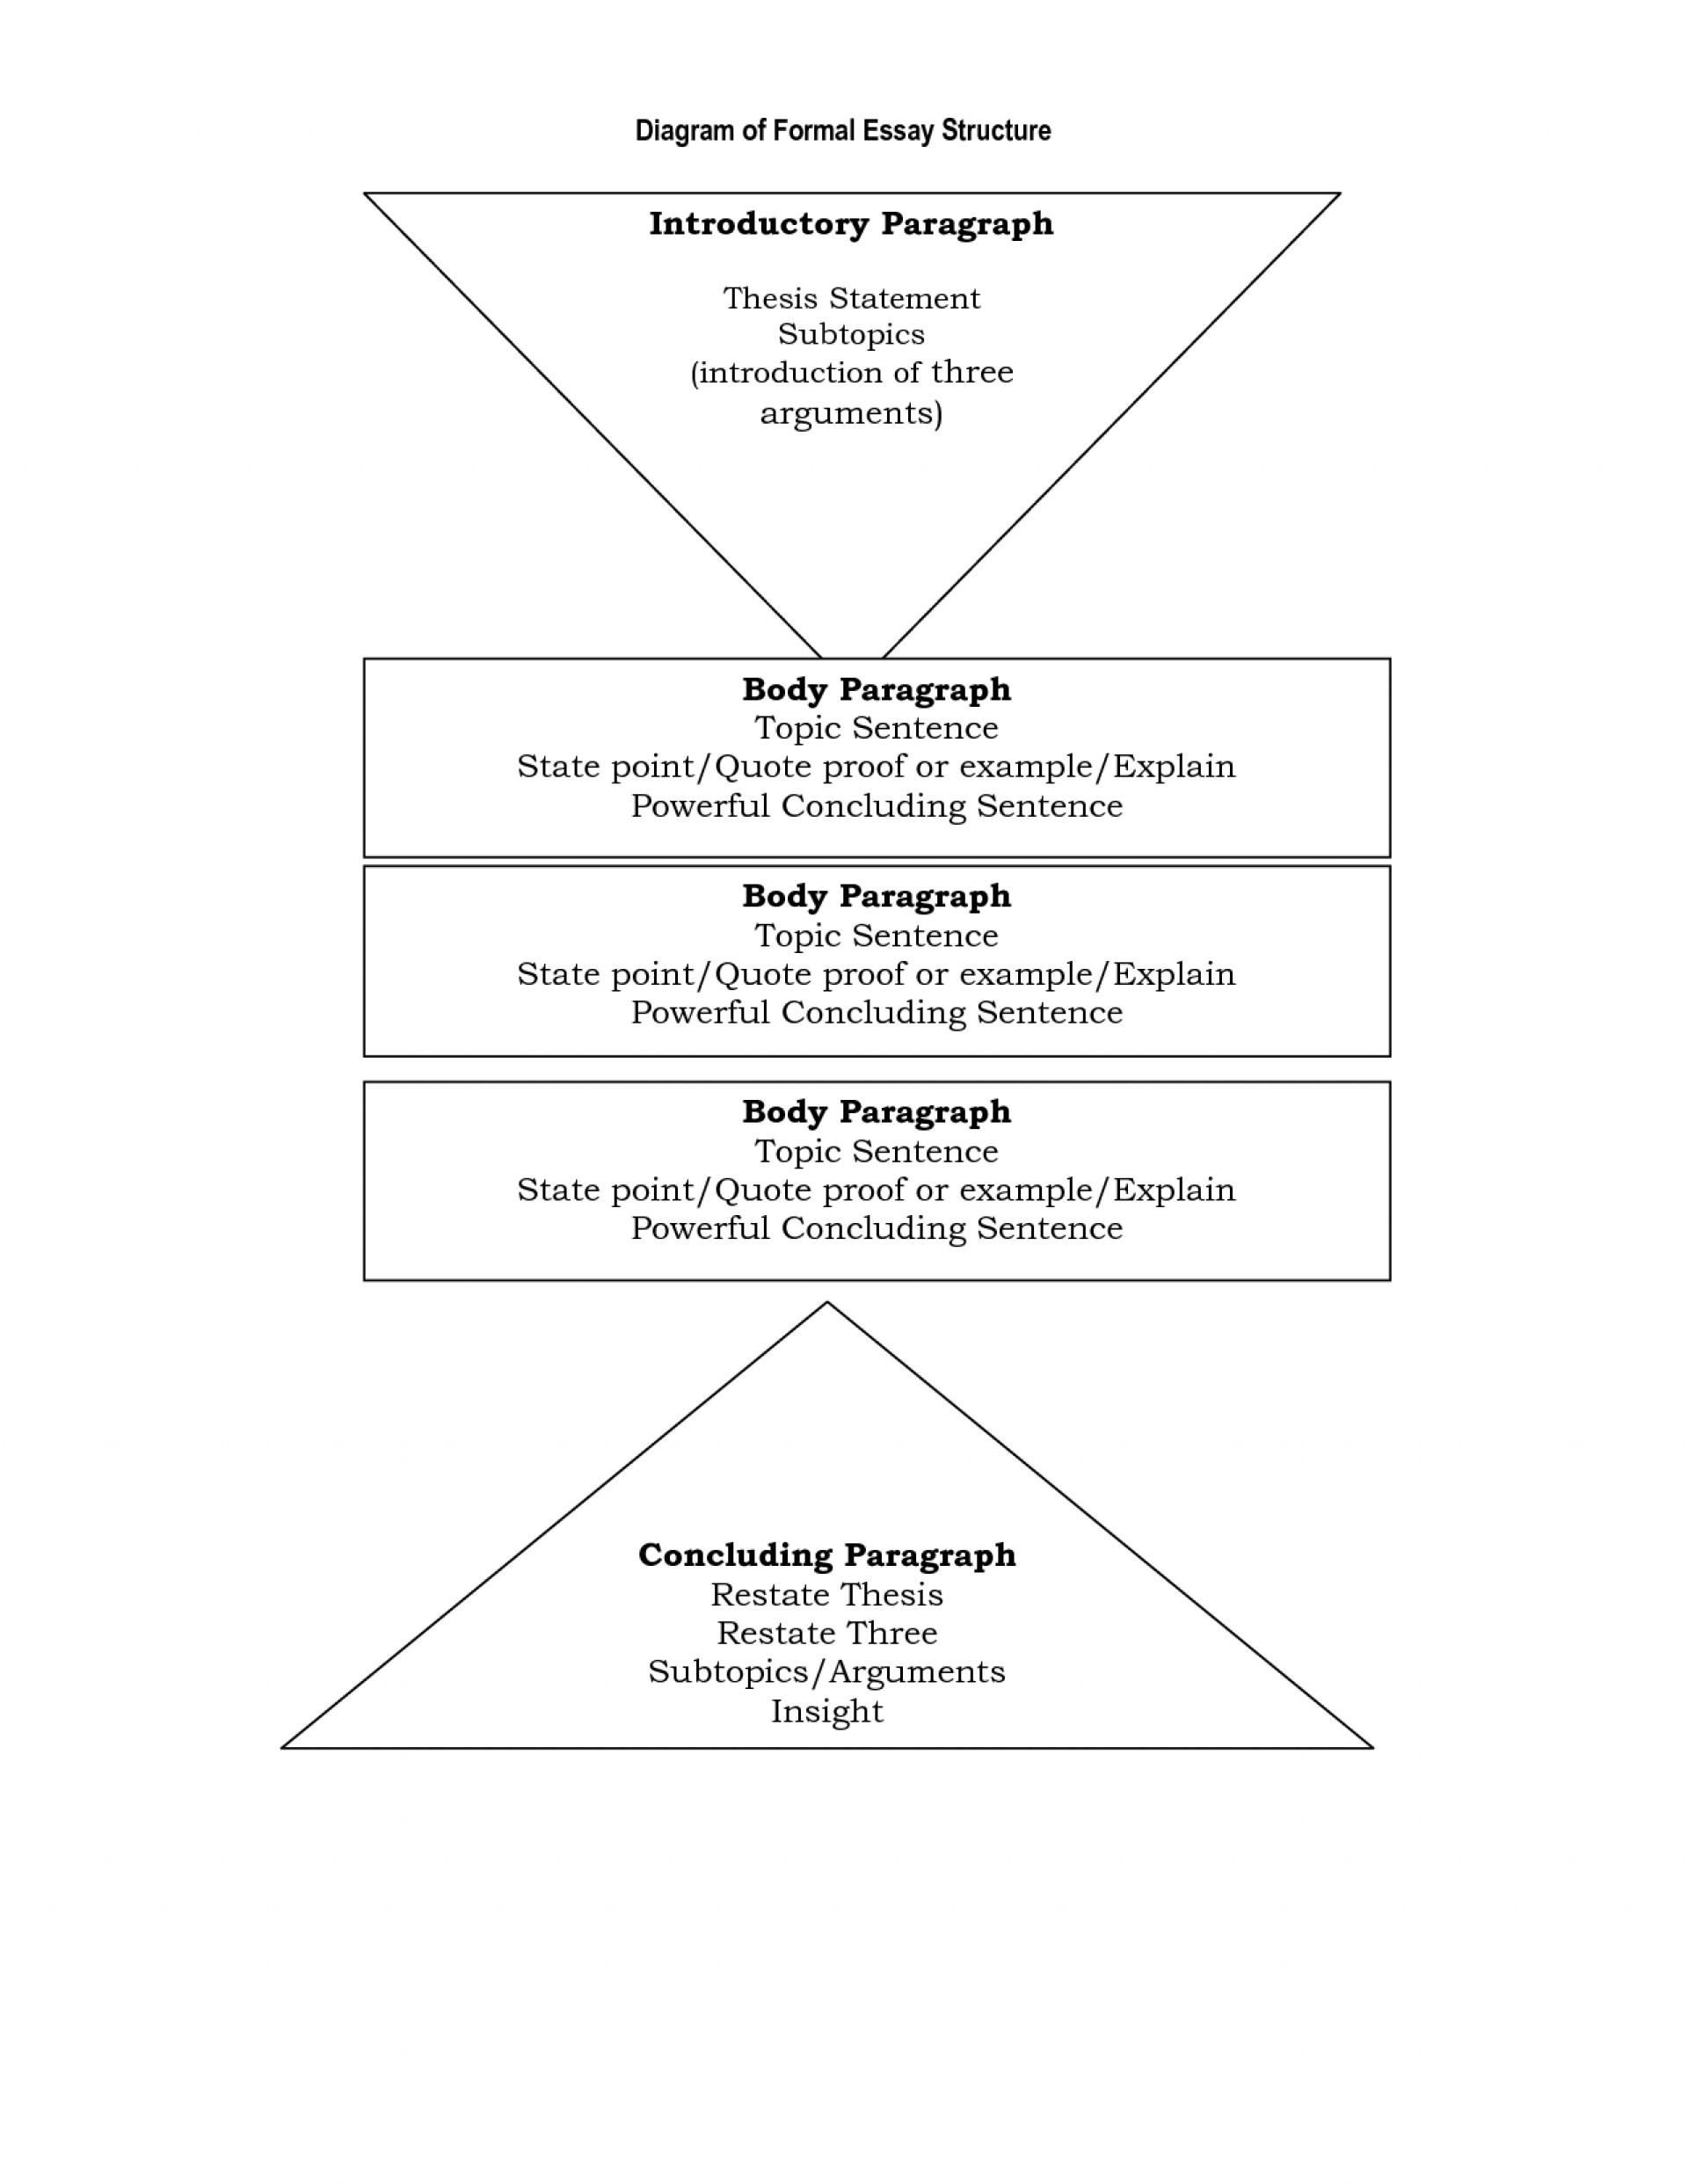 014 Research Essay Structure Paper Outline Apa Para Argumentative Rebuttal Esl Example Igcse Pdf Ielts Qut Ppt Of Breathtaking An (advanced Module) 1920